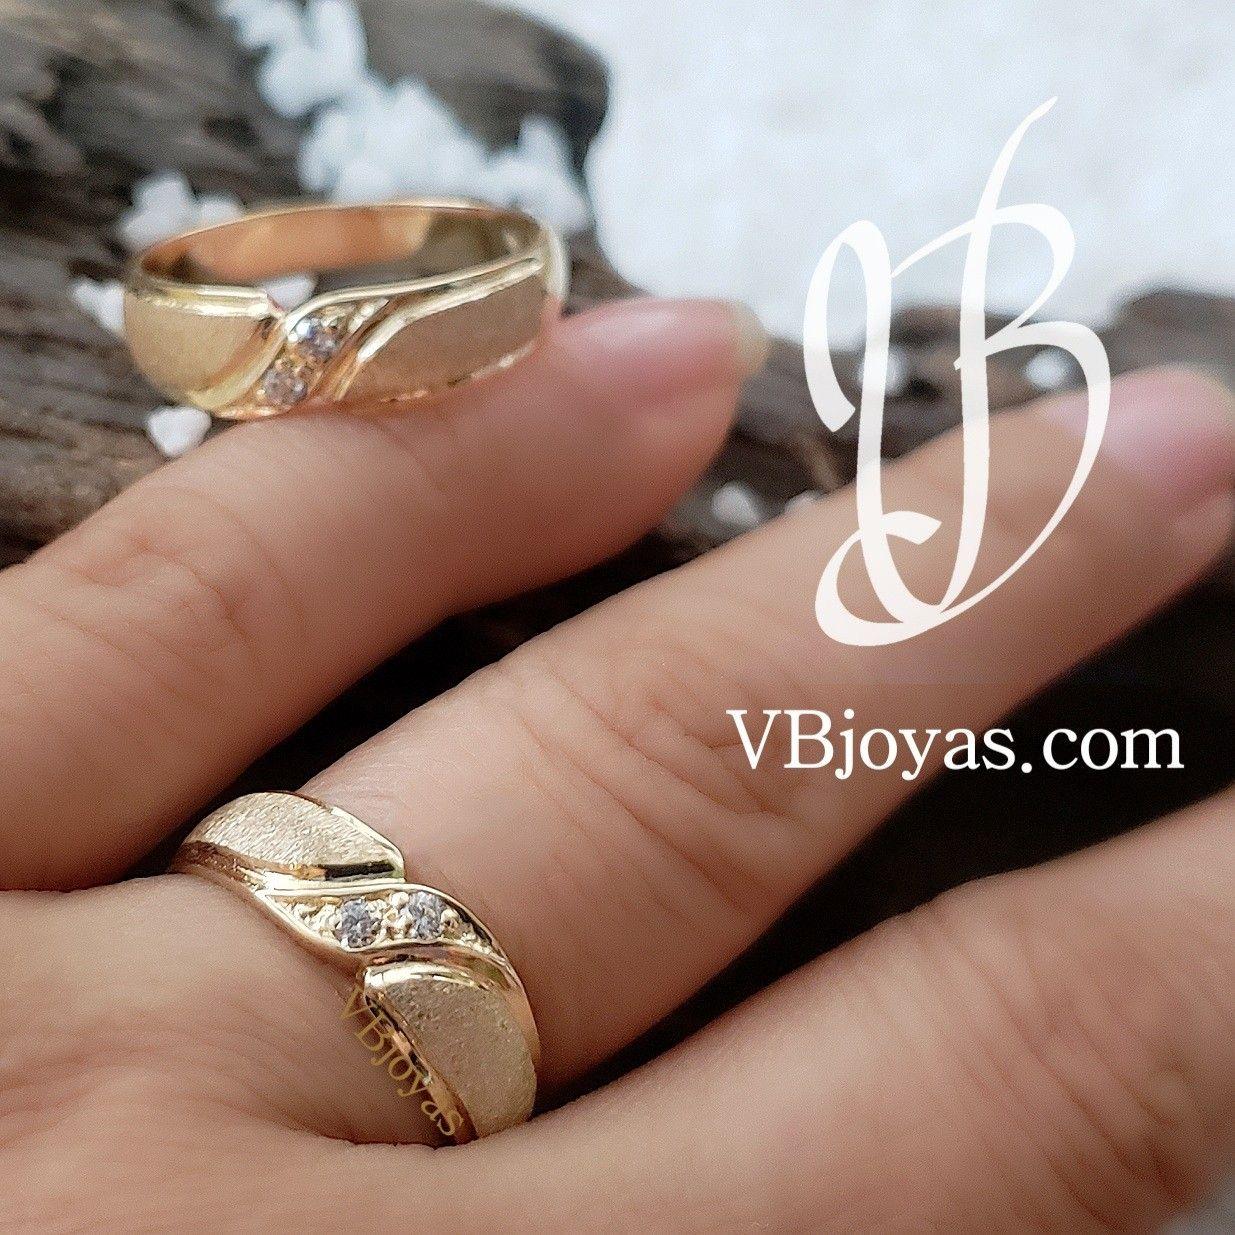 Aros De Matrimonio Alianzas Wedding Band 18k Gold Vbjoyas Ecuador Engagement Rings Engagement Jewelry